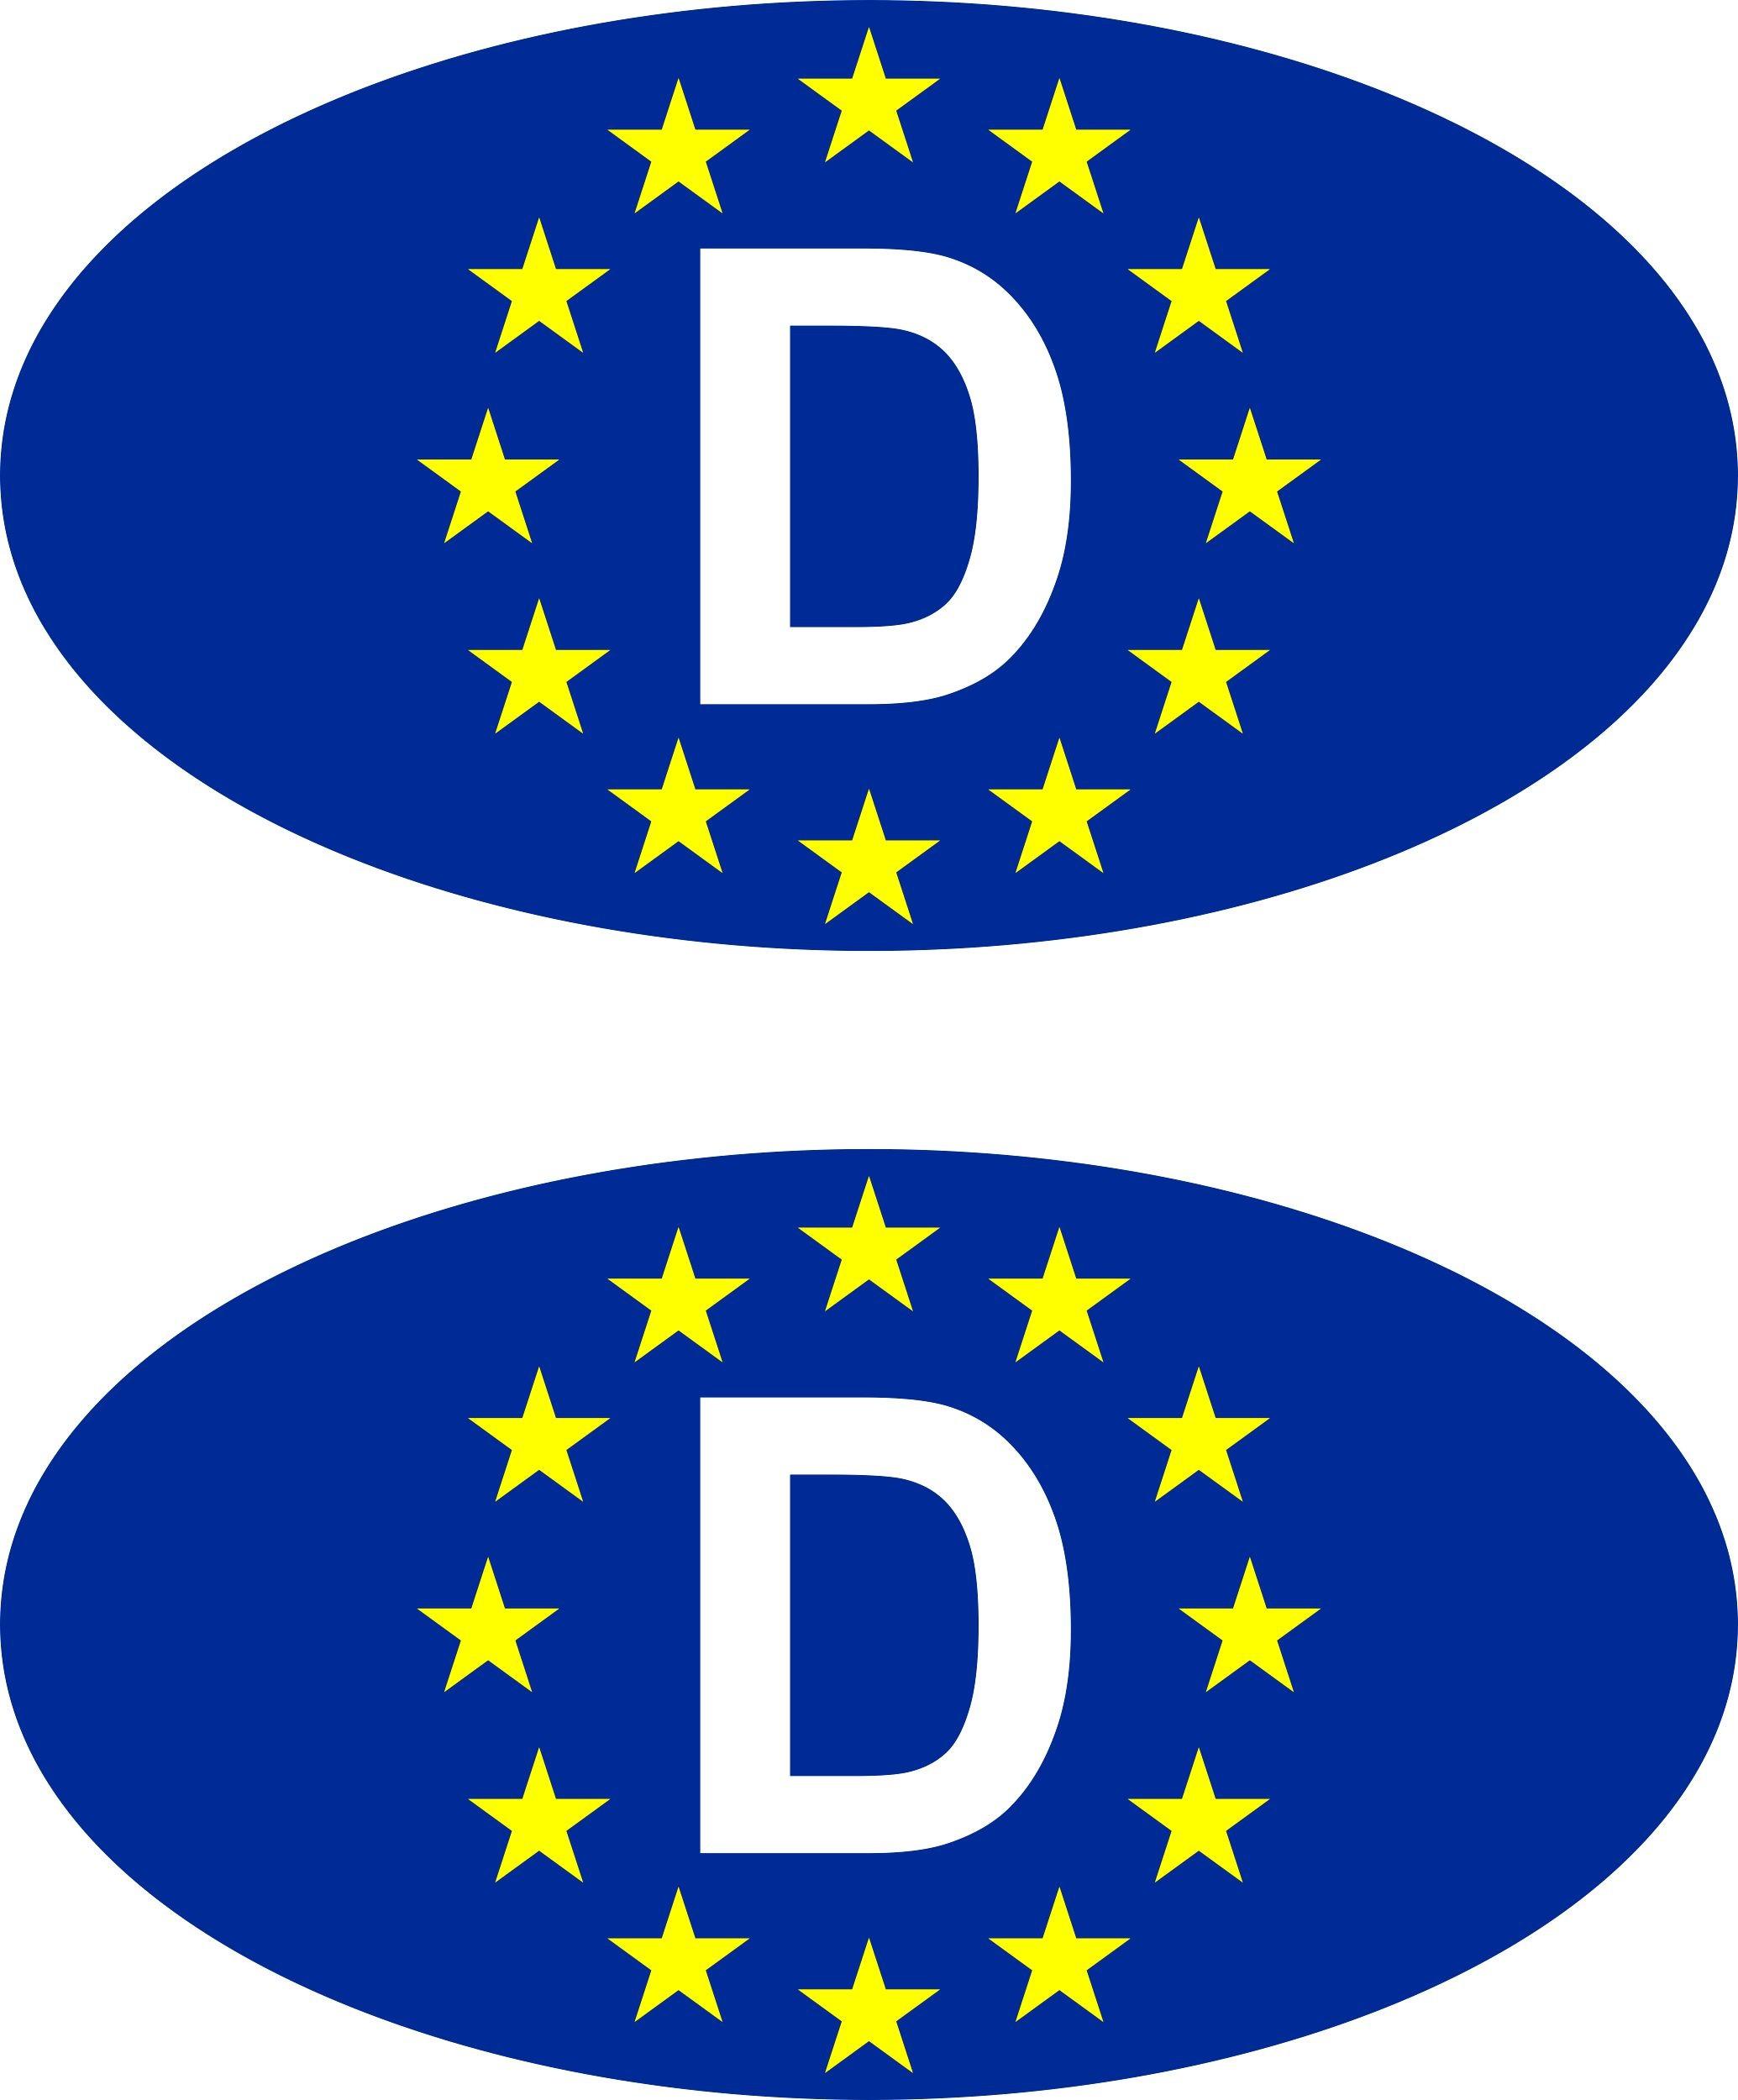 Aufkleber Europa-D Dimension 2er-Set je 25 x 40 mm Deutschland Fanartikel Olympia – Bild 1